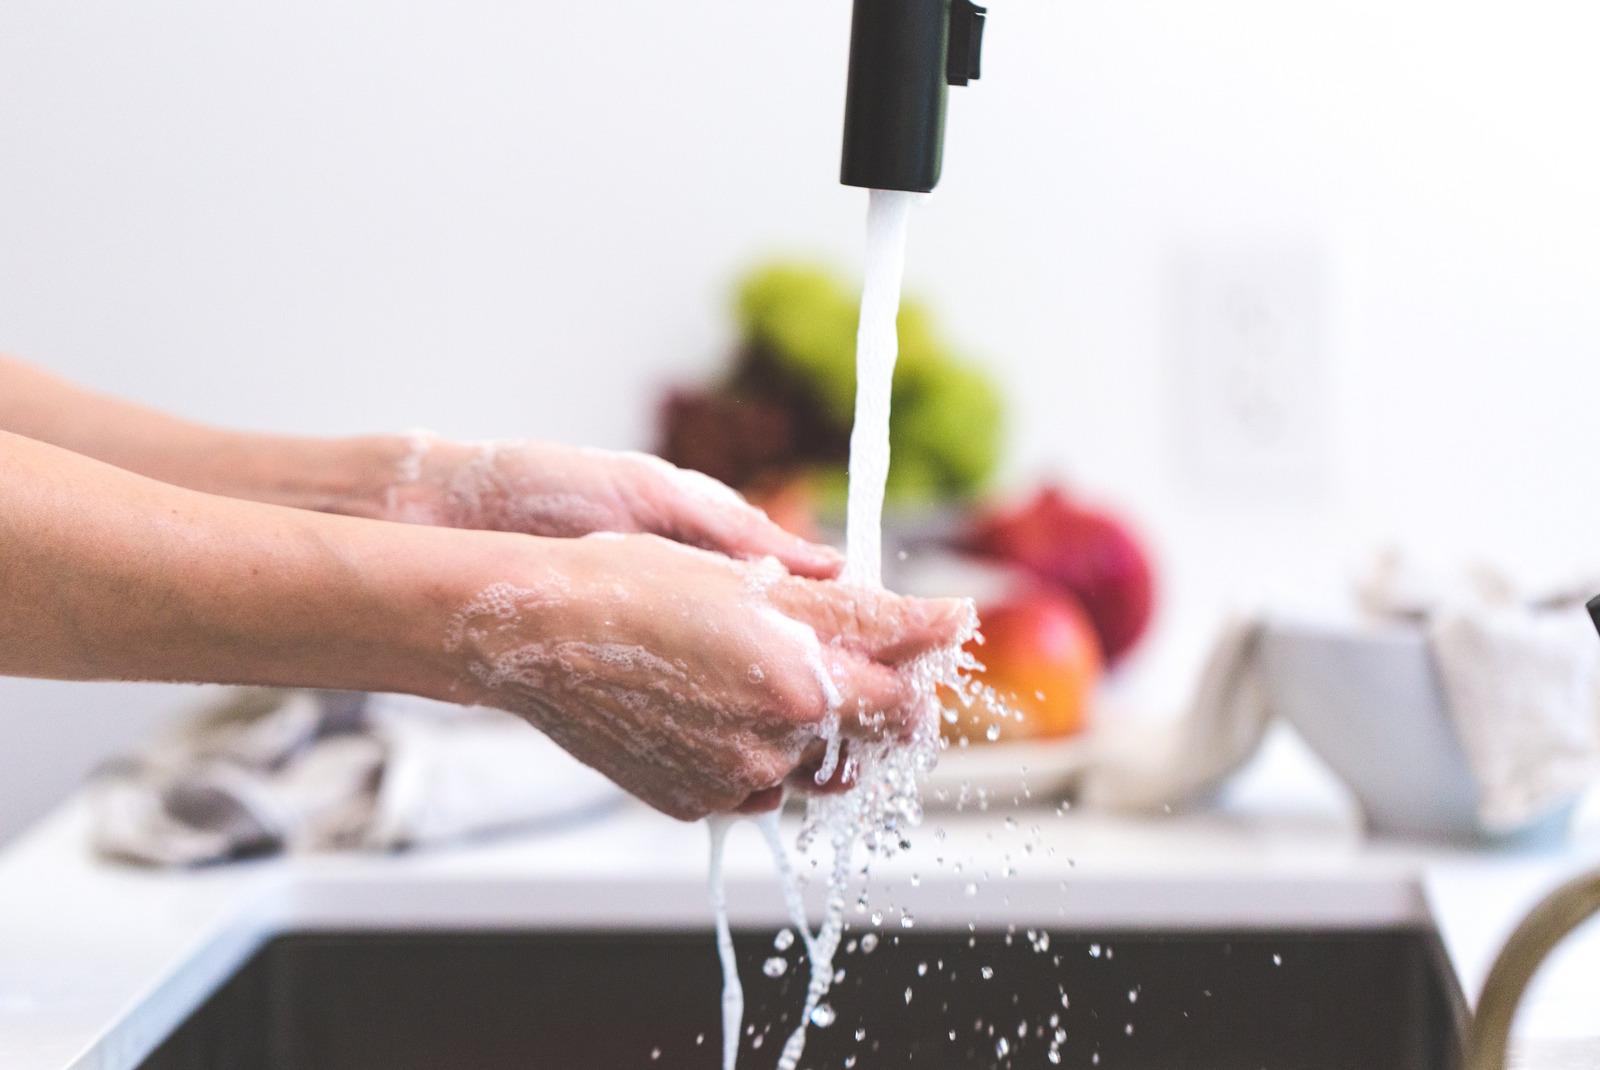 как мыть руки при коронавирусе